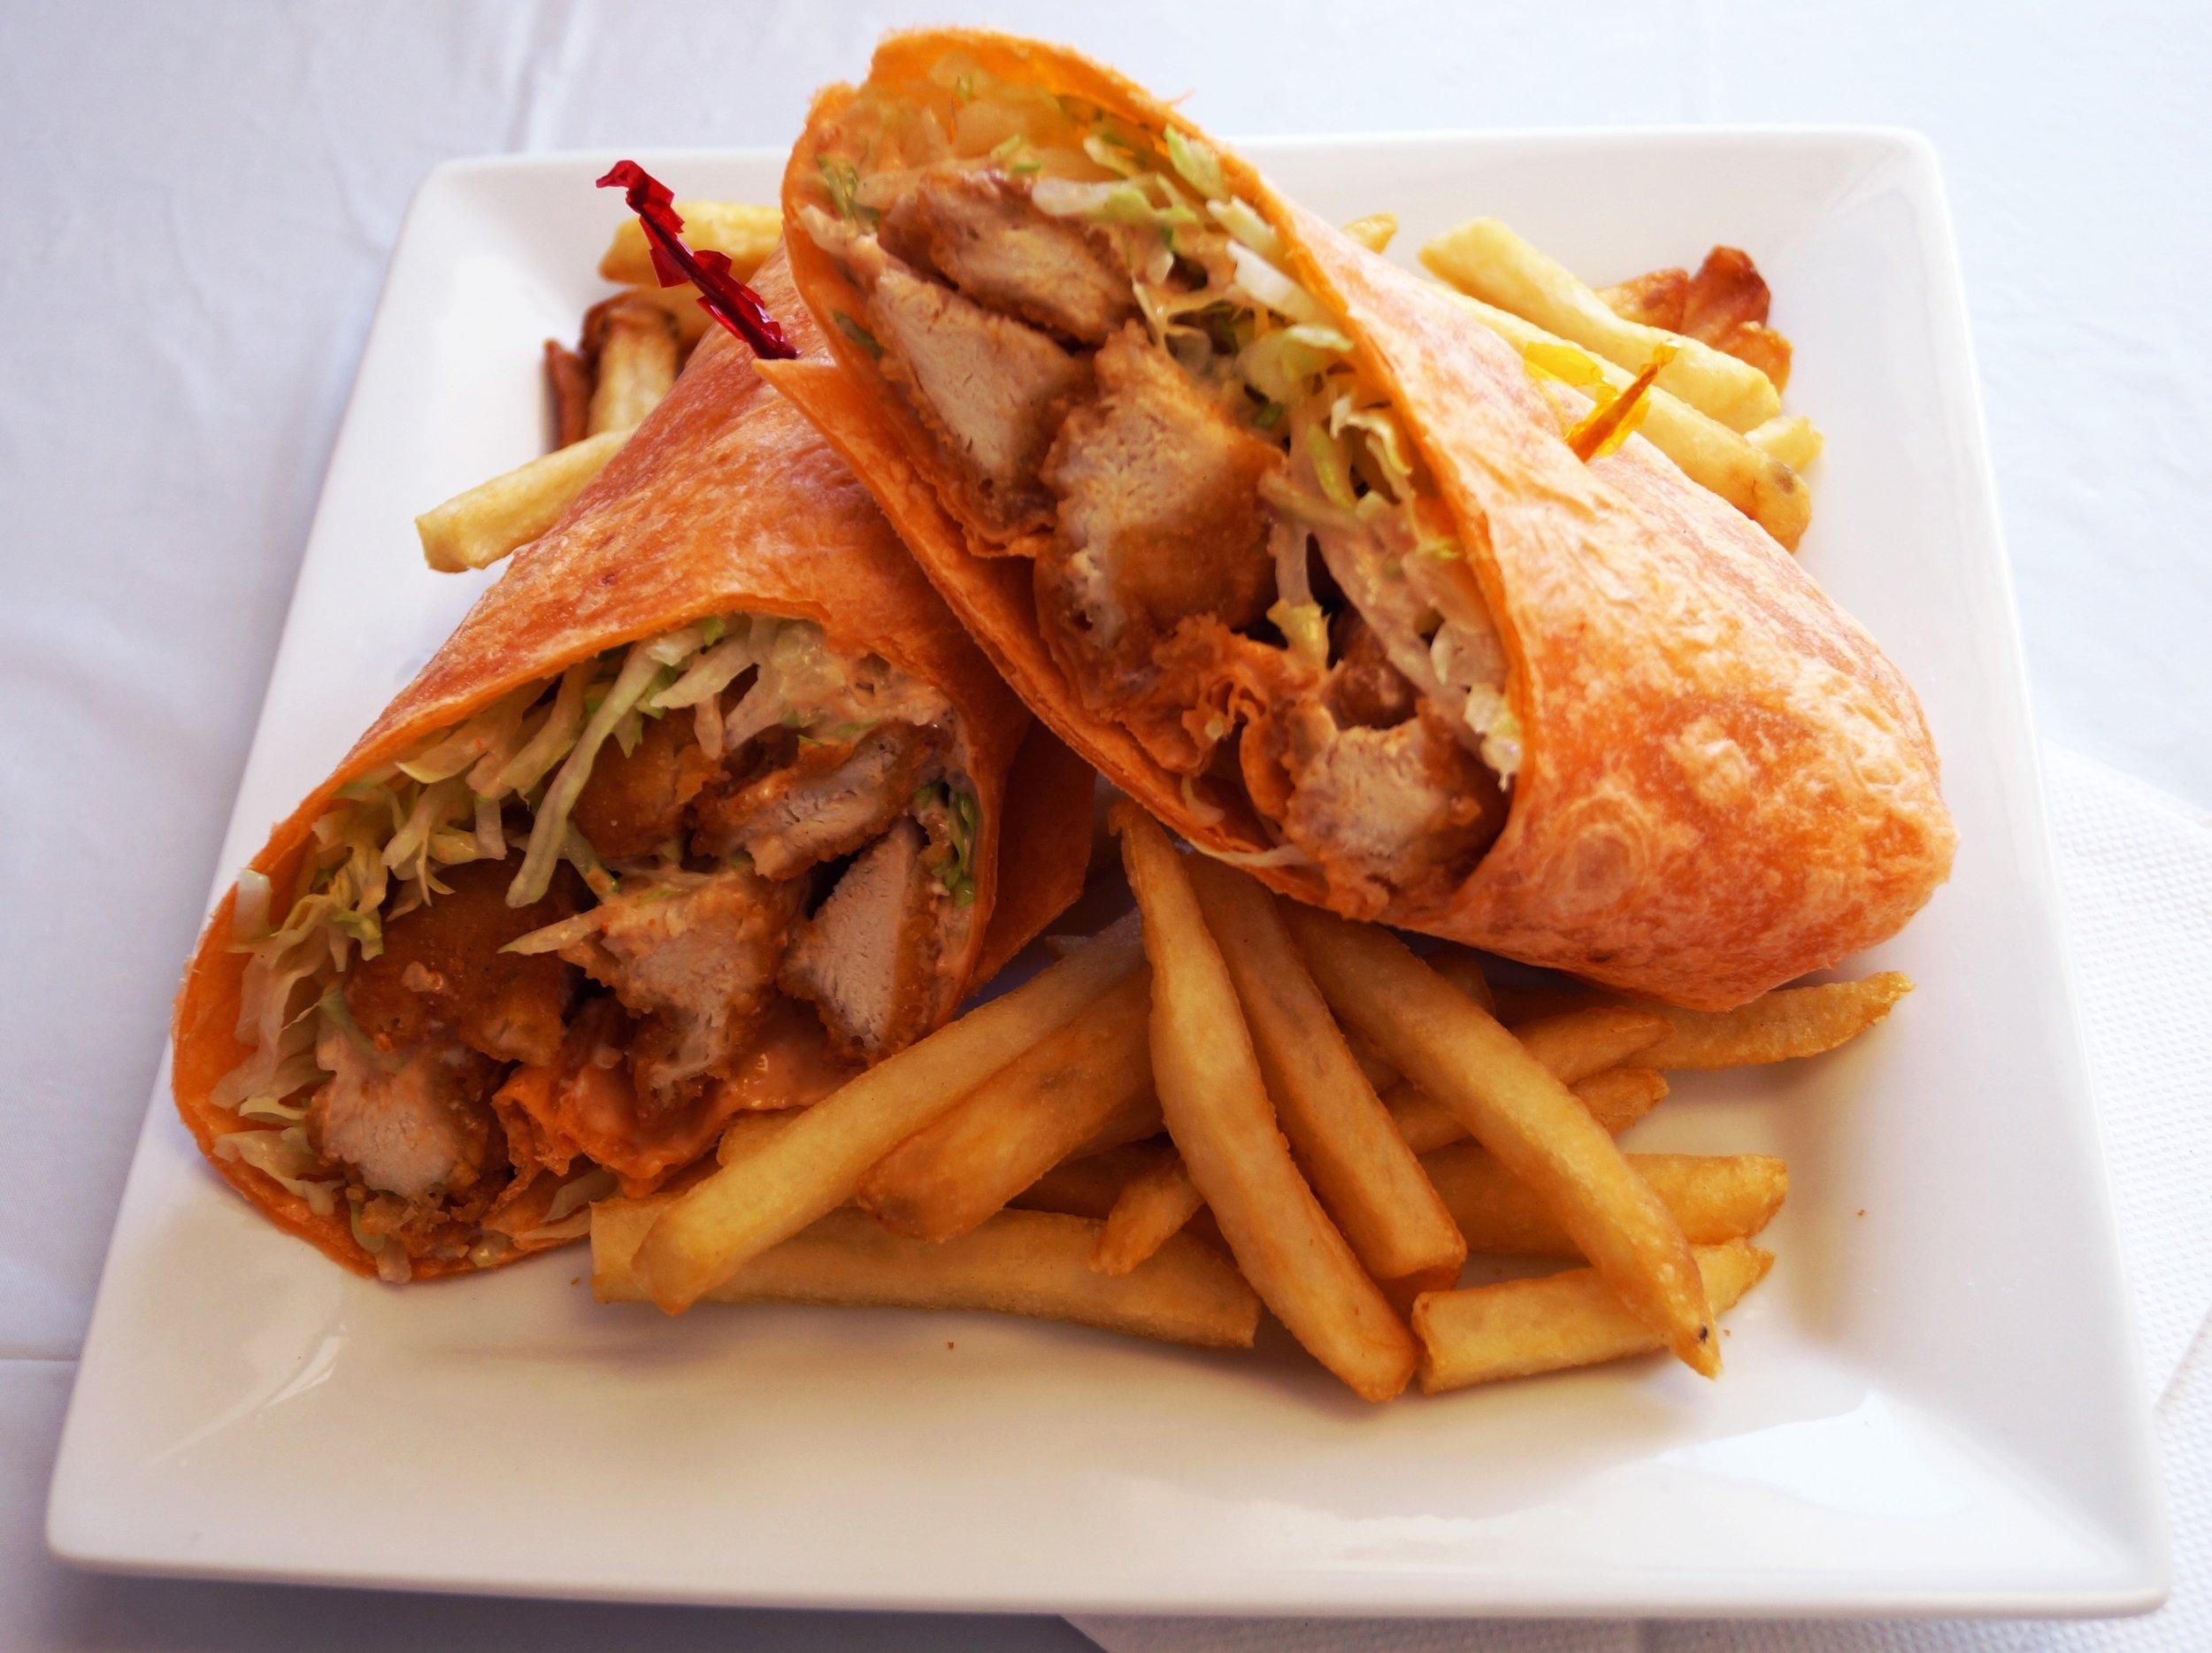 royal-roast-beef-BuffZone-chicken-wrap.jpg